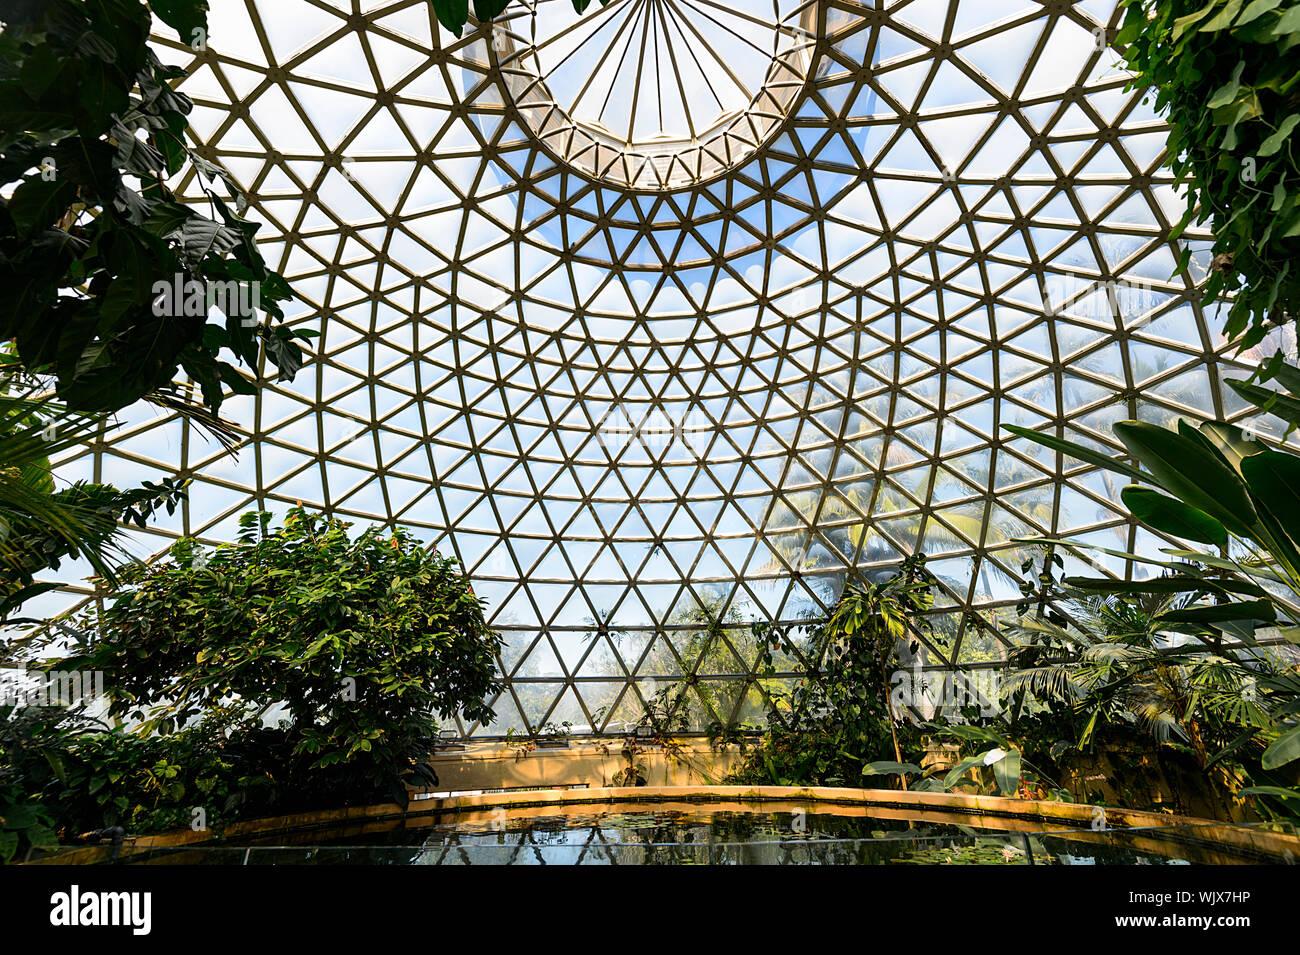 Inside the Tropical Display Dome at Mt Coot-tha Botanic Gardens, Brisbane, Queensland, QLD, Australia Stock Photo